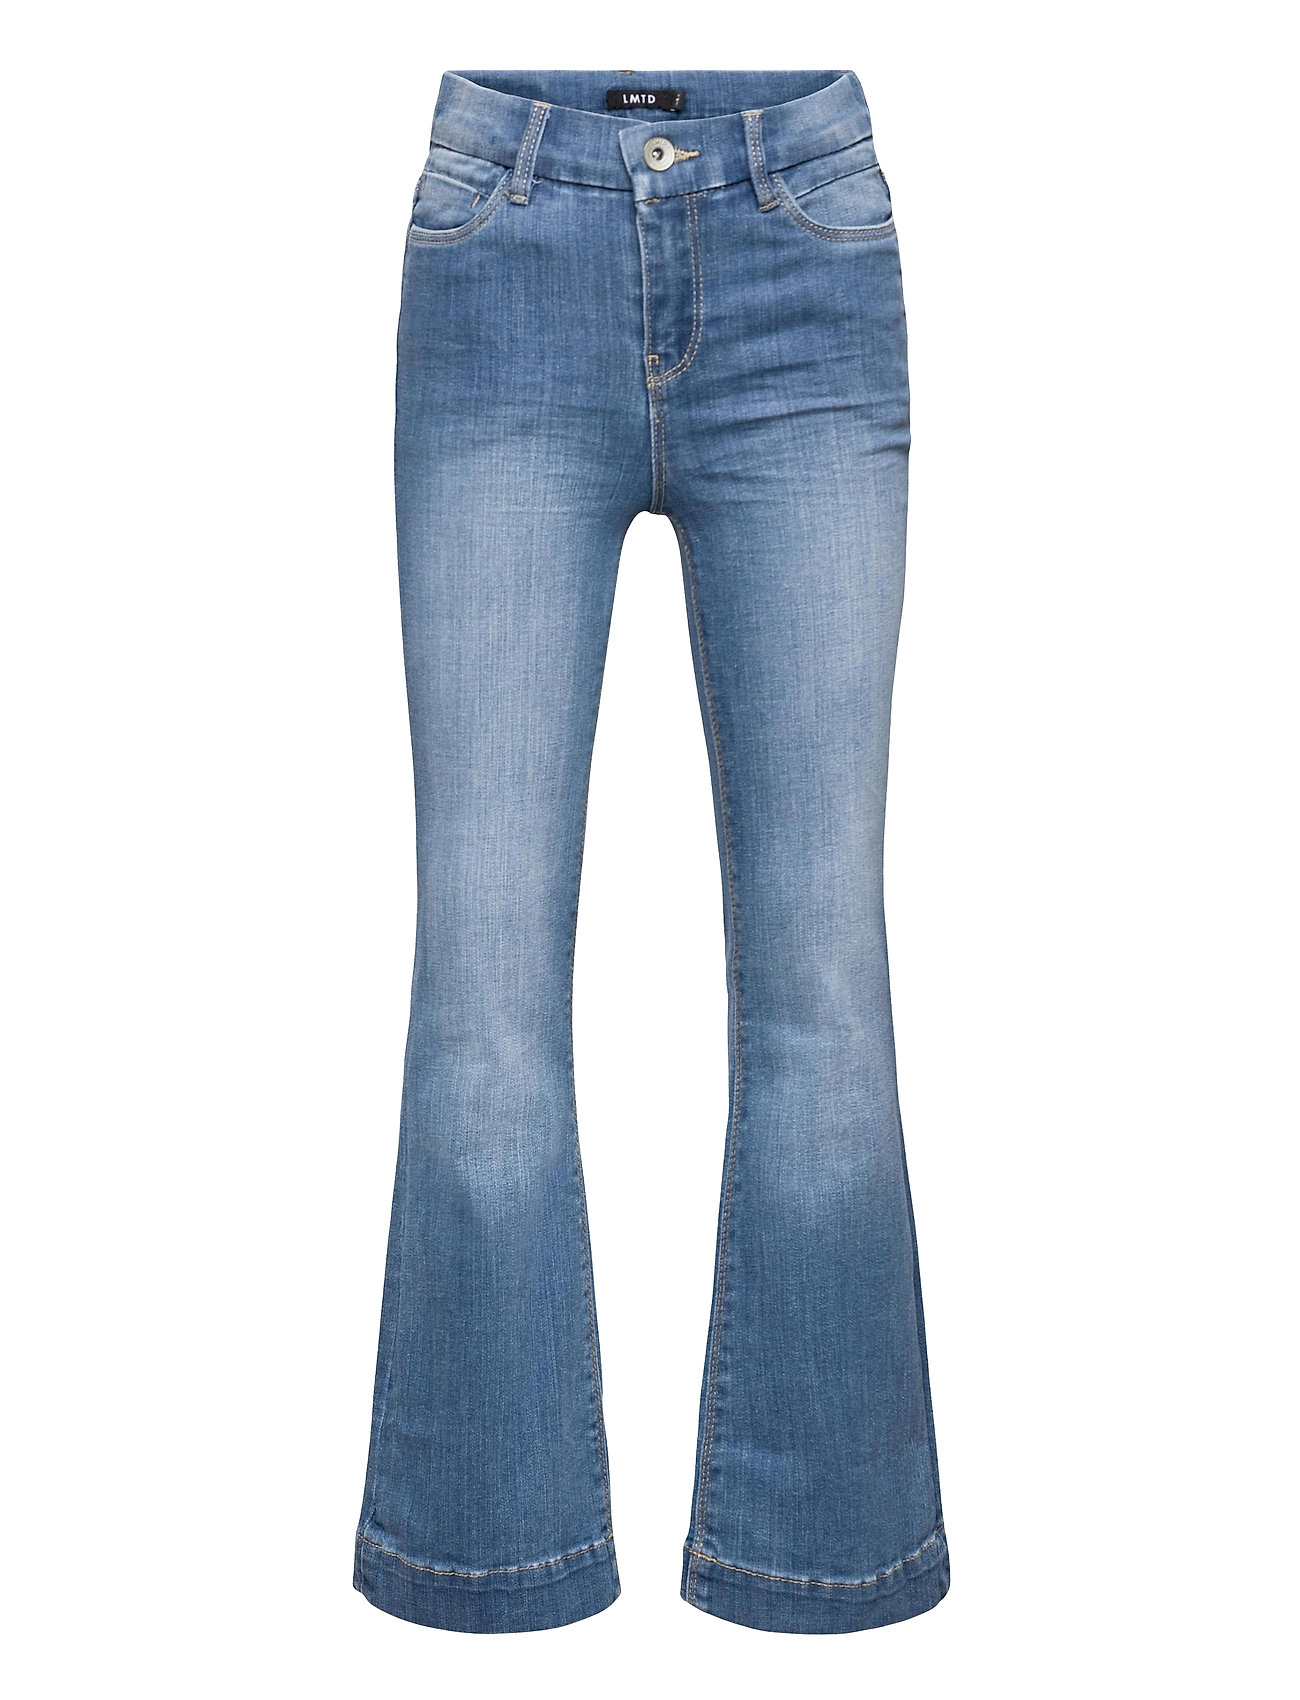 Image of Nlfpil Dnmatejas 2455 Hw Boot Pant Noos Jeans Boot Cut Blå LMTD (3490306609)